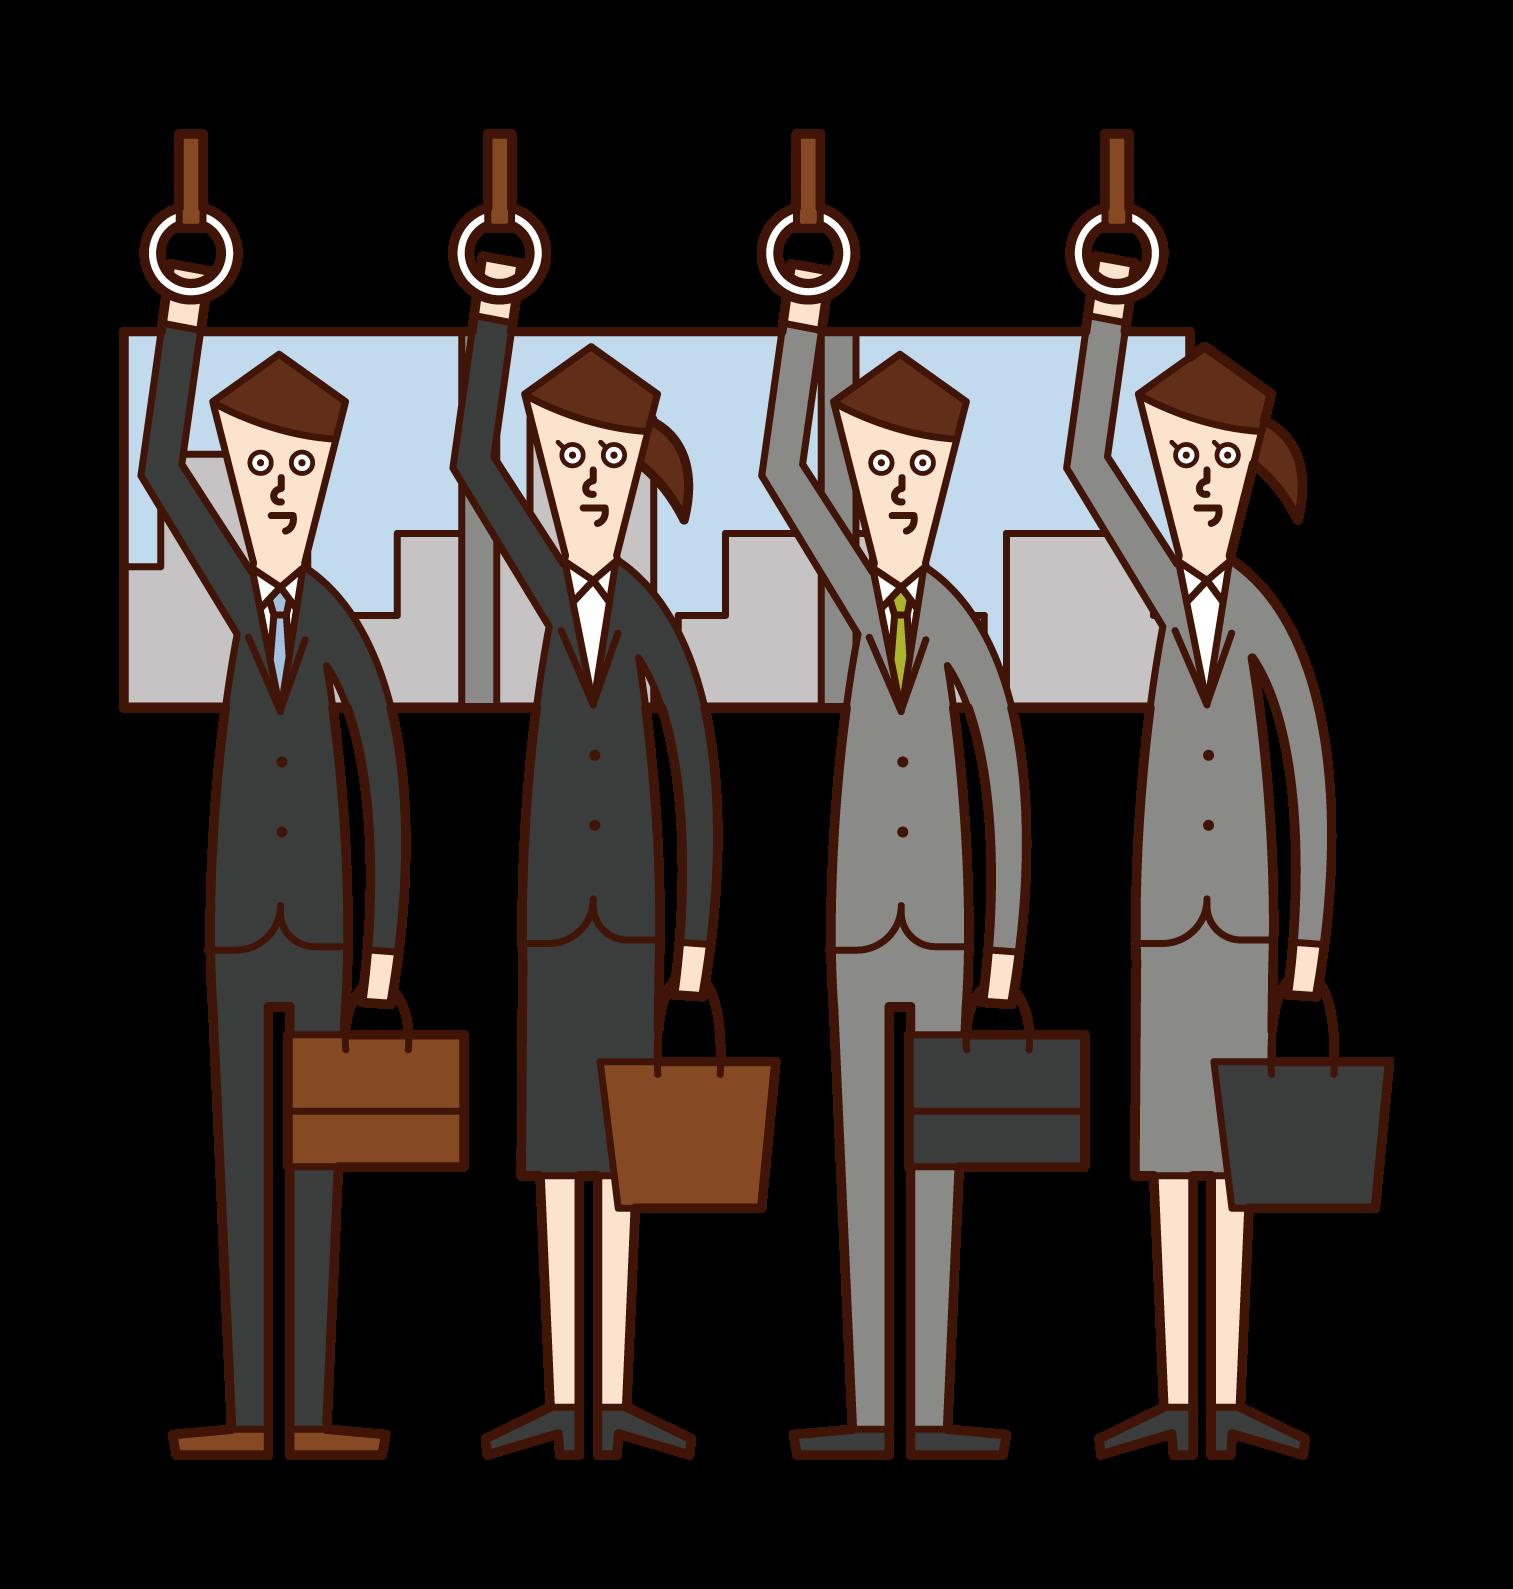 Illustration of people on commuter train